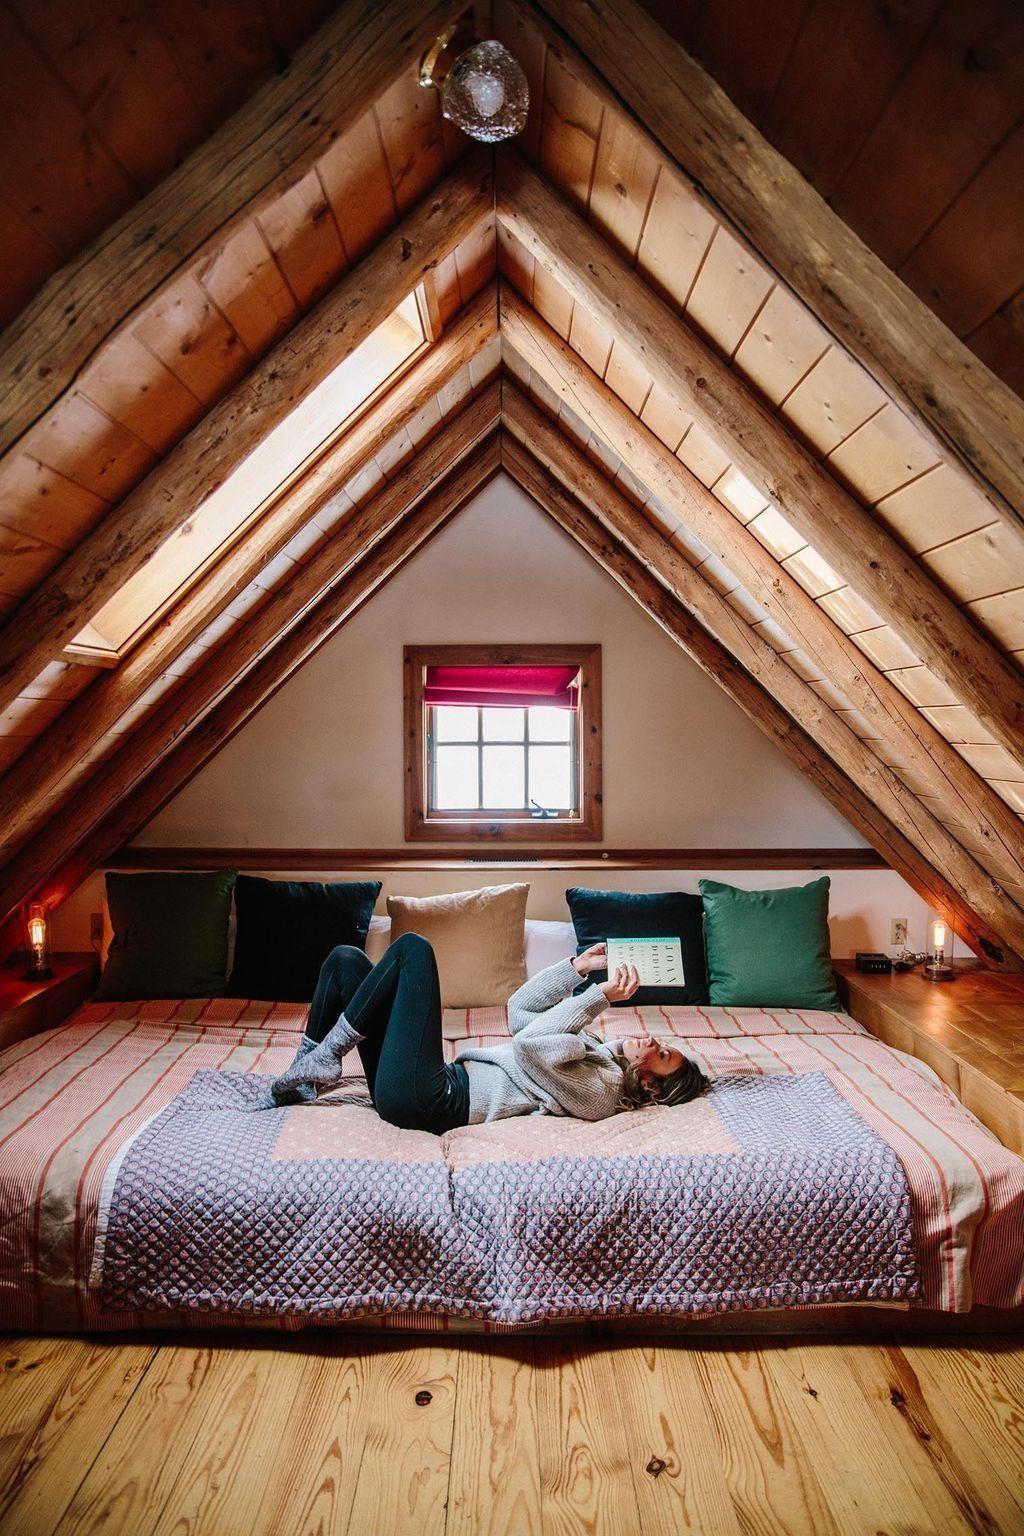 44 Stunning Attic Bedroom Decorating Ideas Attic Bedroom Designs Rustic Bedroom A Frame House Attic bedroom layout ideas